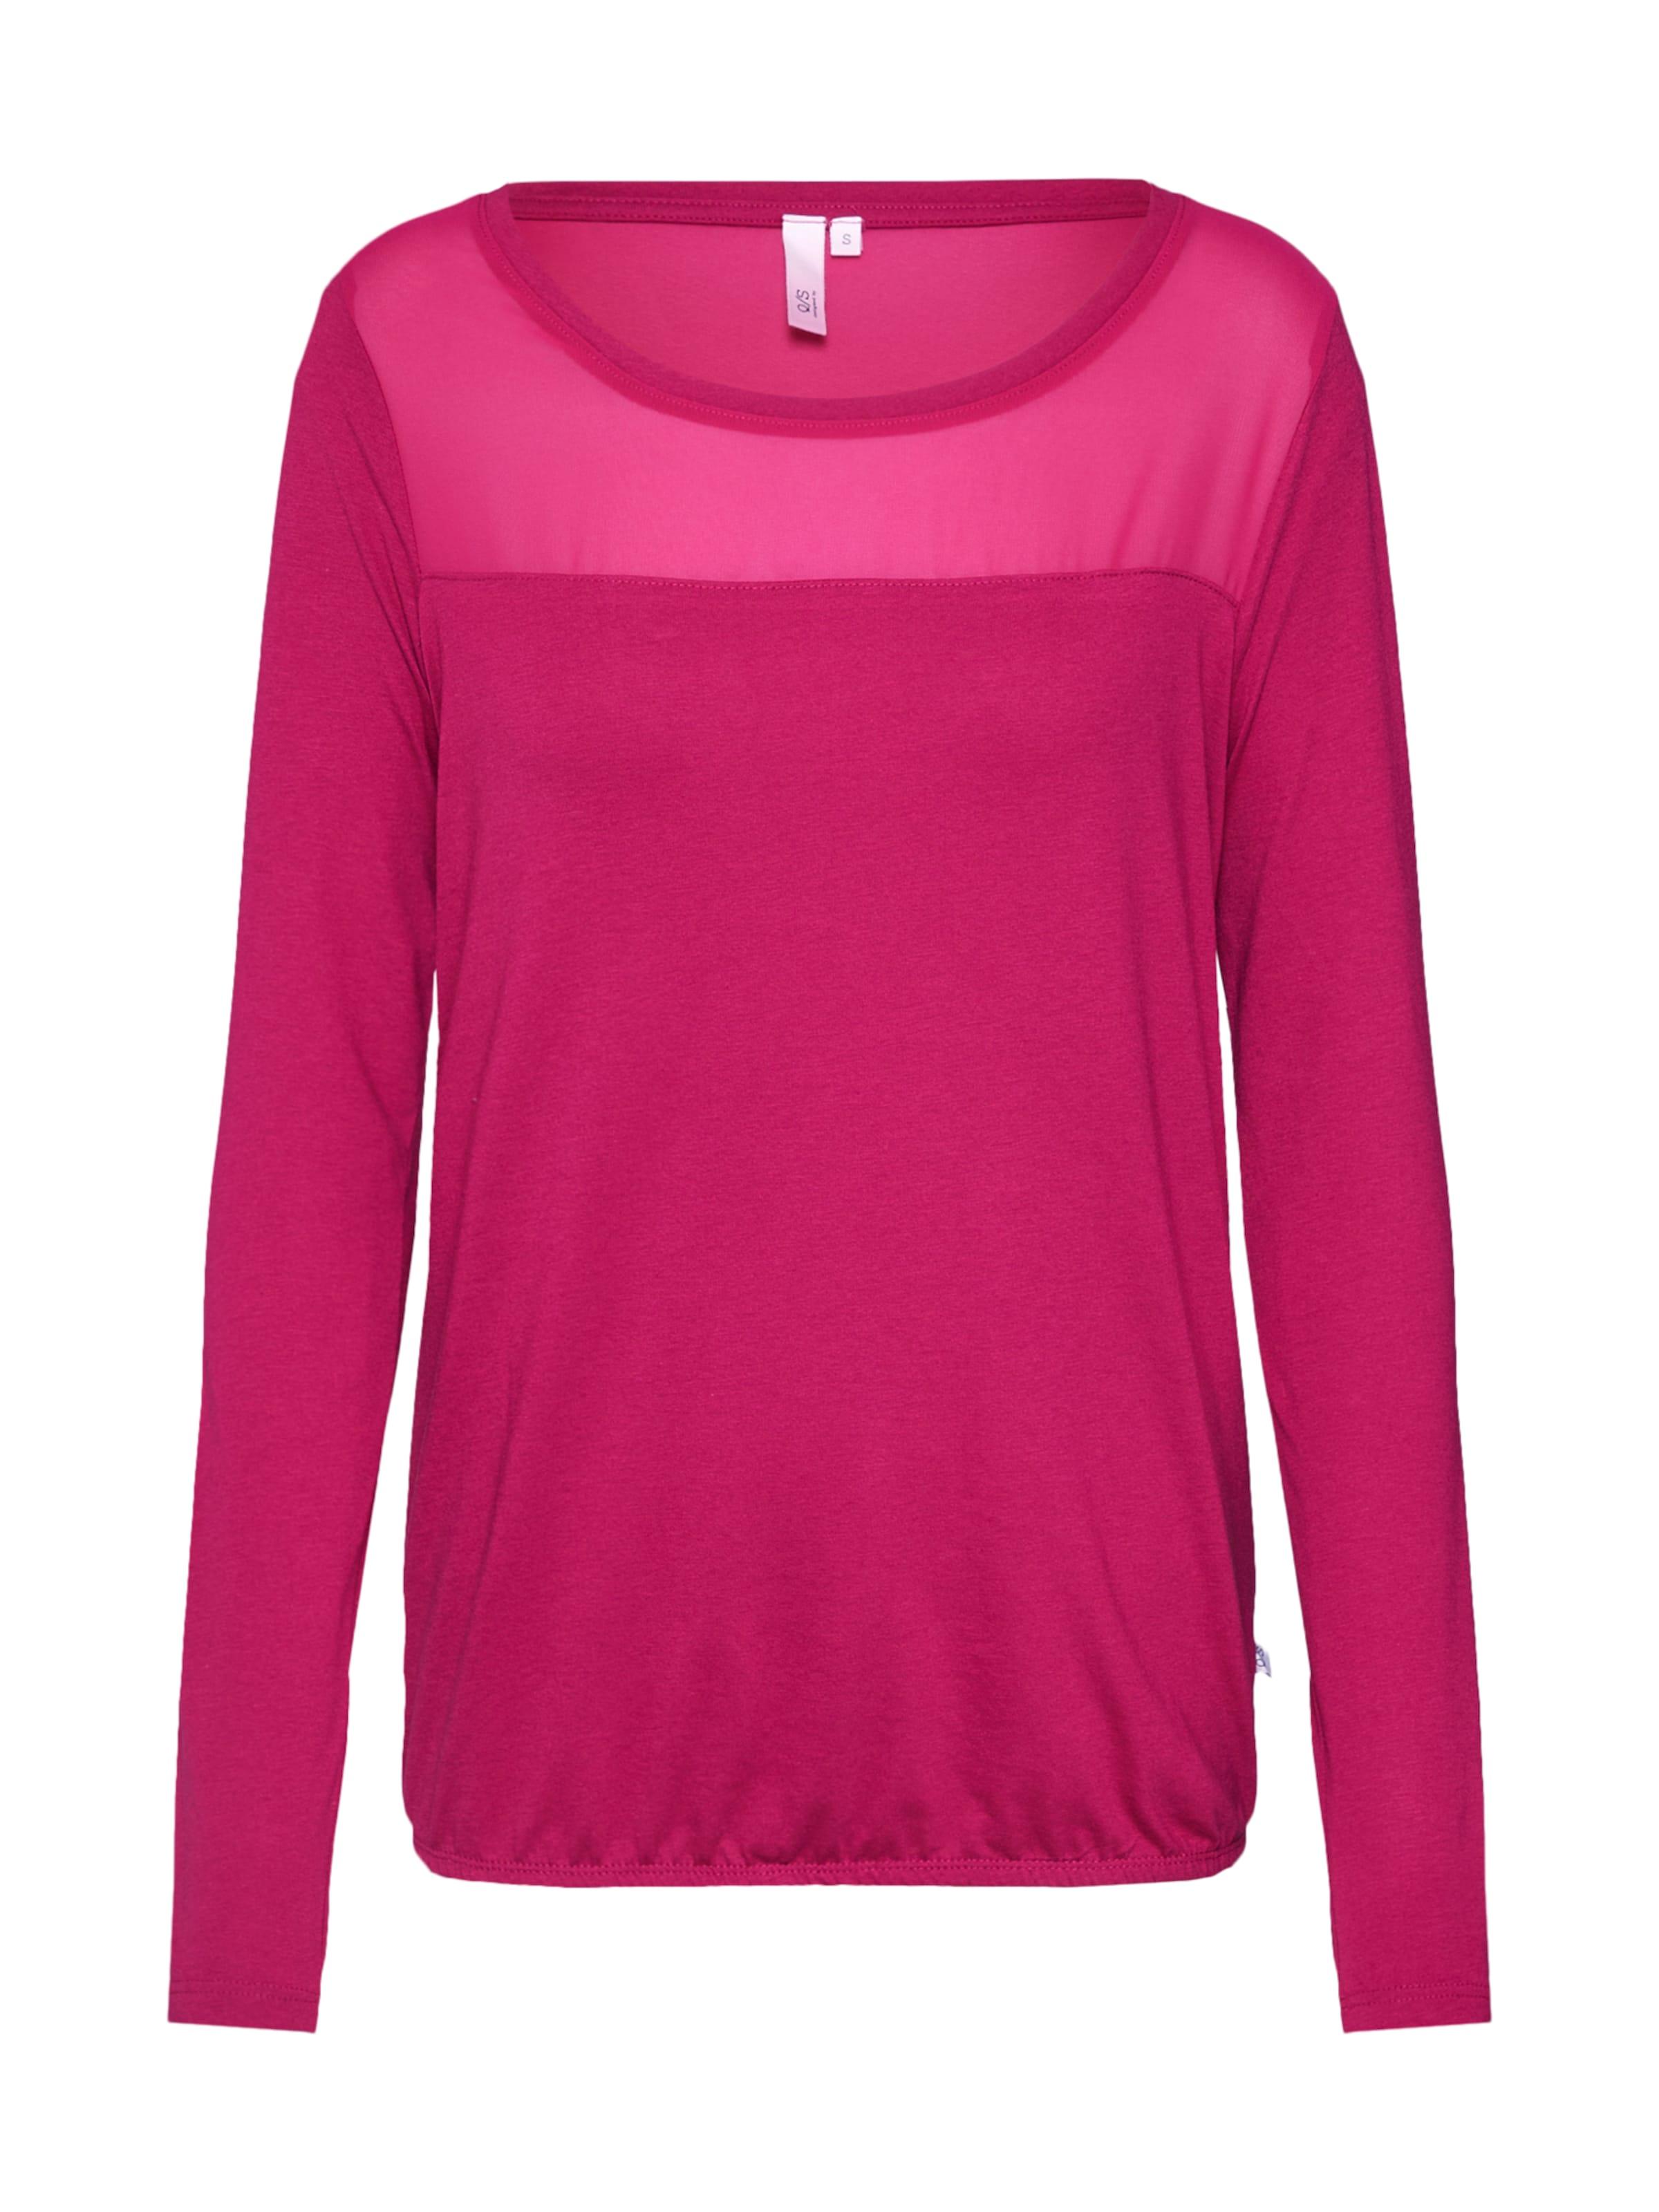 Q T s Designed By shirt En Blanc LVGzMSUpq